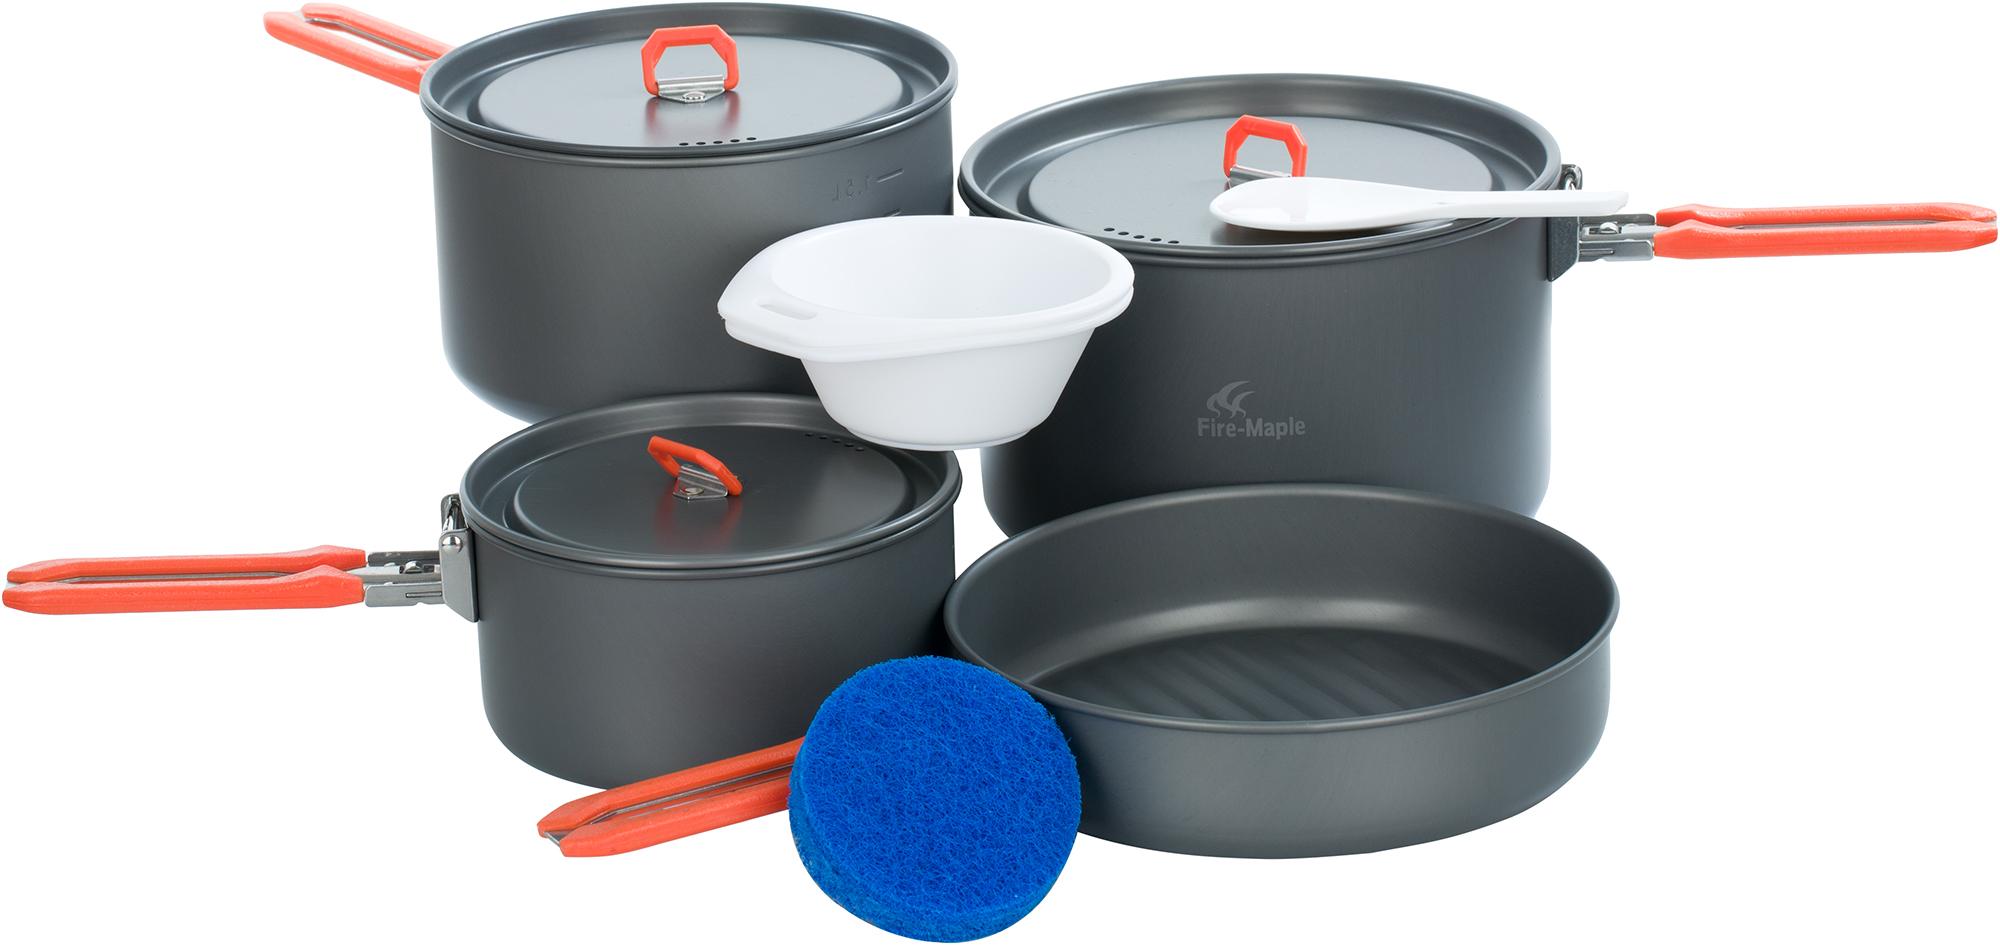 Fire-Maple Набор посуды: 3 котелка, сковорода FEAST 5